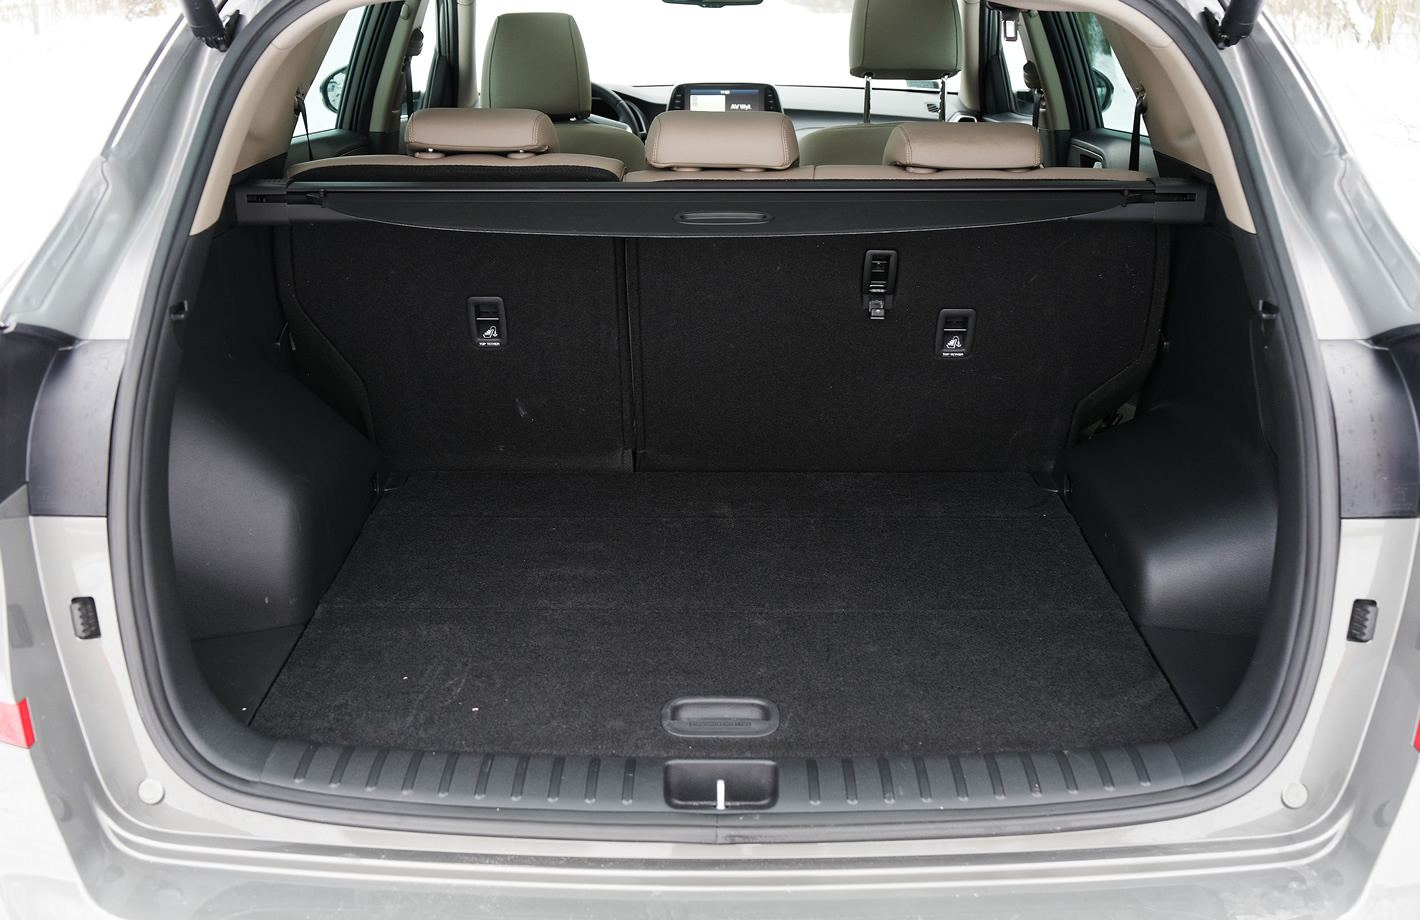 Hyundai Tucson 2.0 CRDi 48V - bagażnik